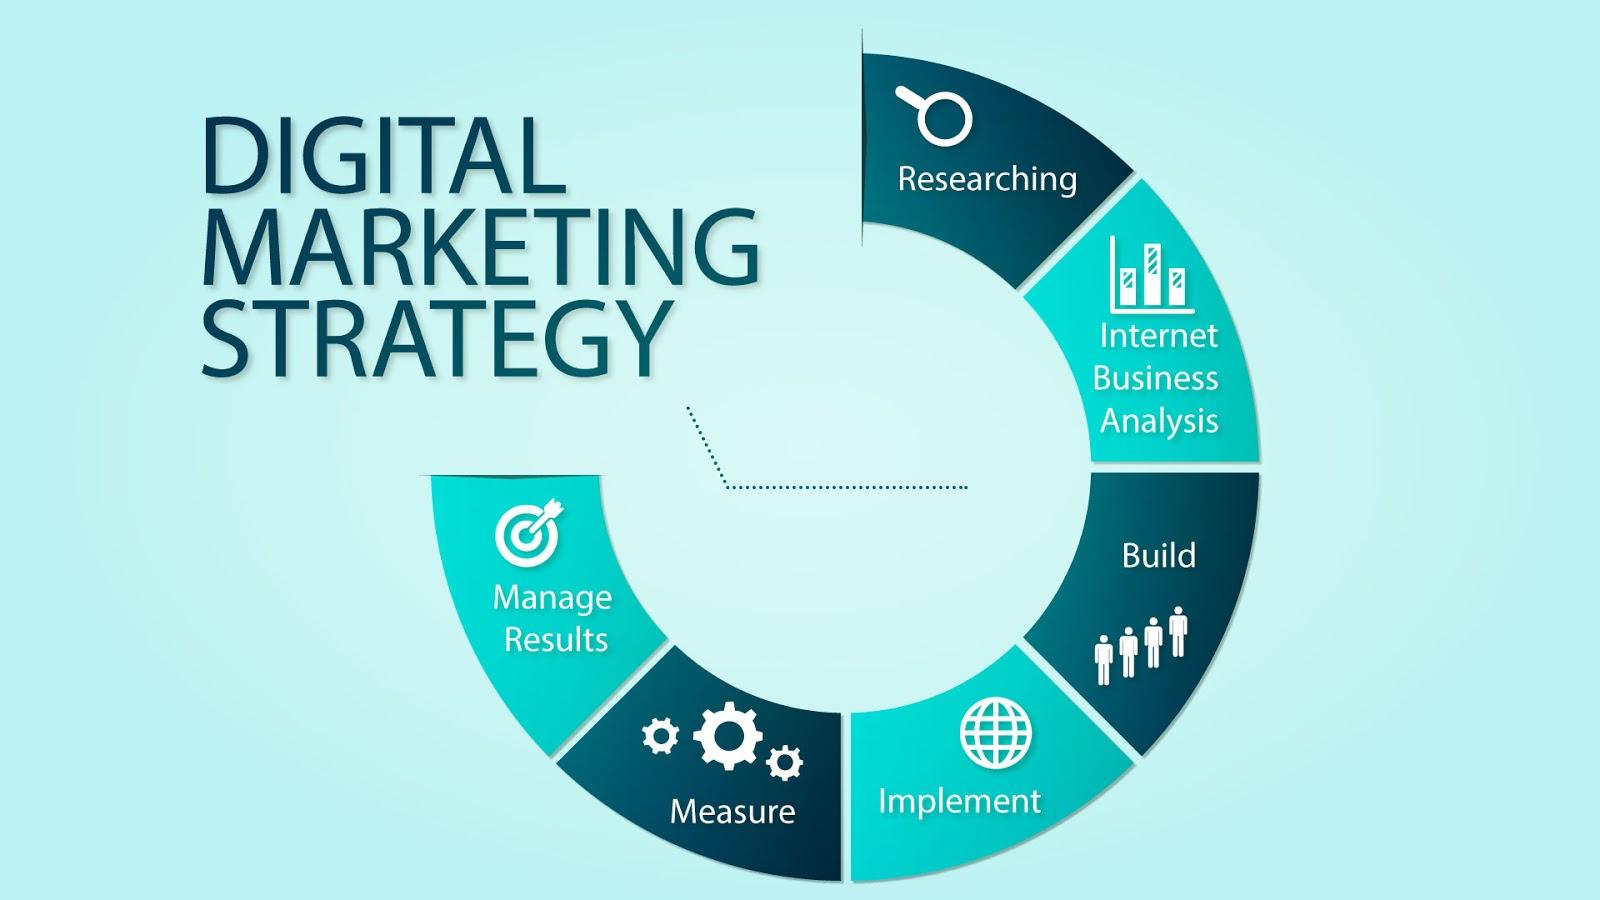 download digital marketing presentation template free - hacking tricks, Marketing Presentation Template Free Download, Presentation templates